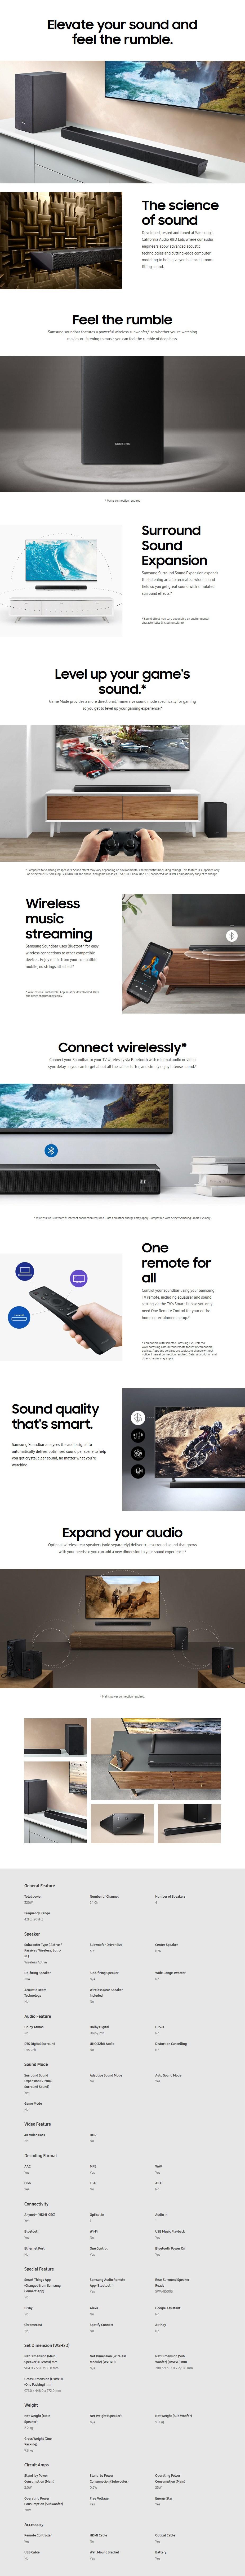 Samsung Series 5 HW-R550 2.1 Soundbar - Desktop Overview 1